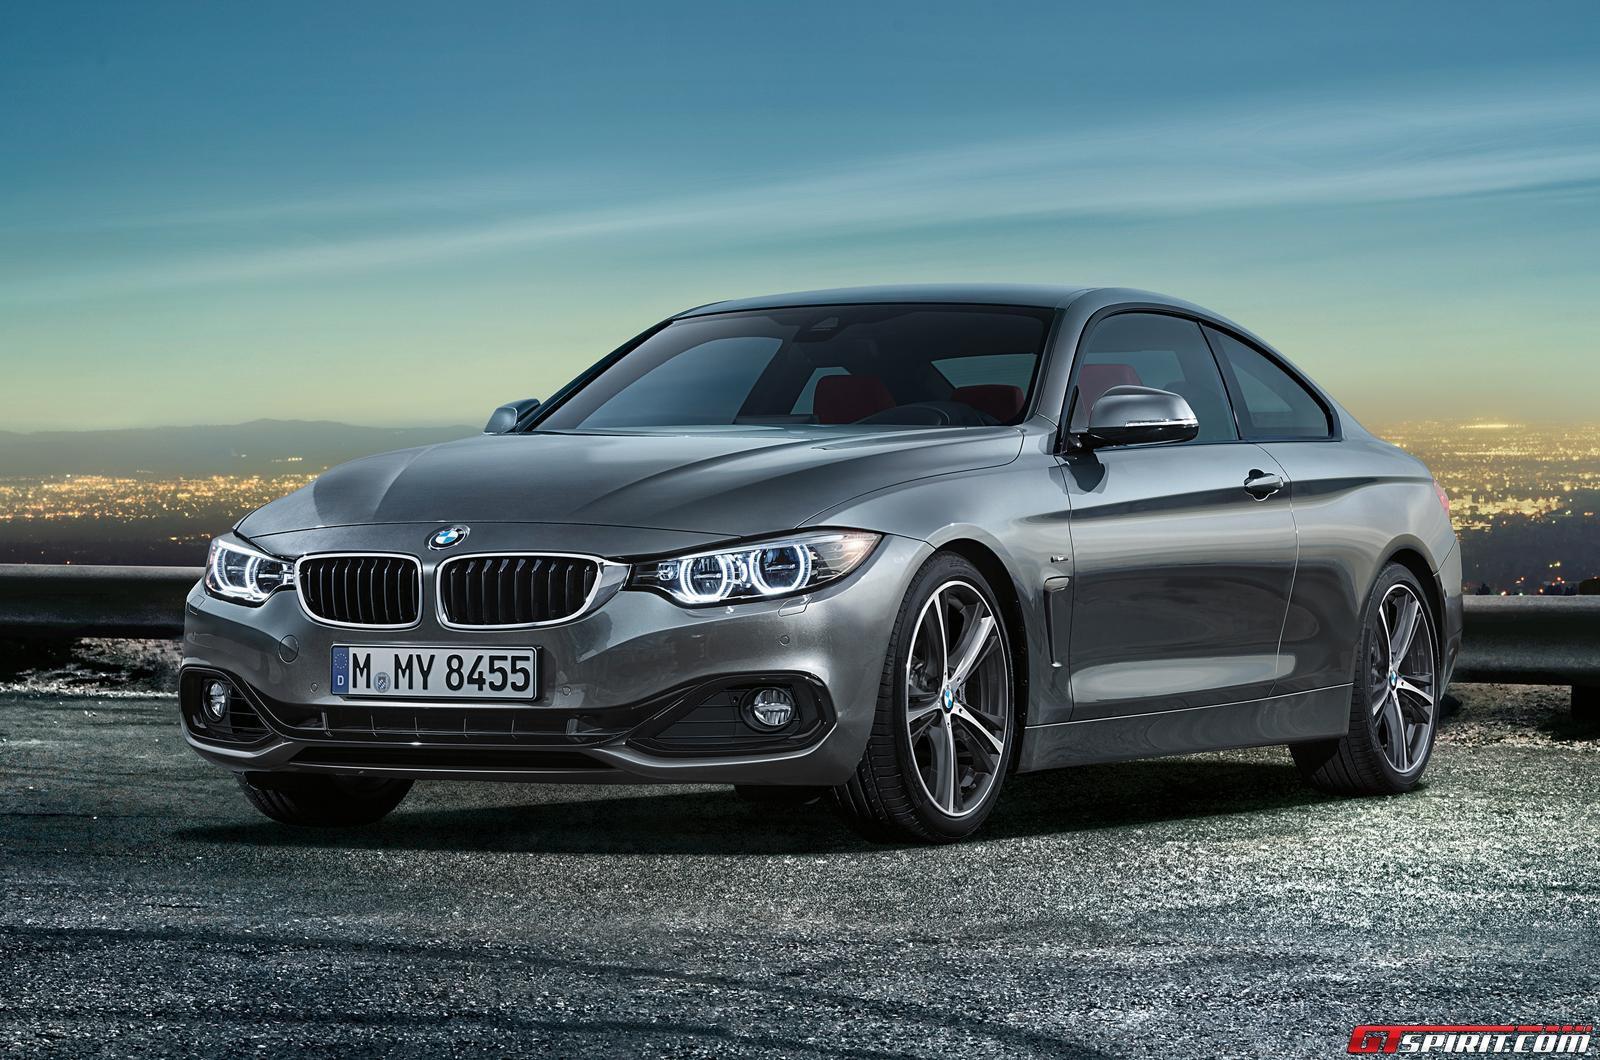 BMW triệu hồi hơn 75,000 xe đời 2012-2014